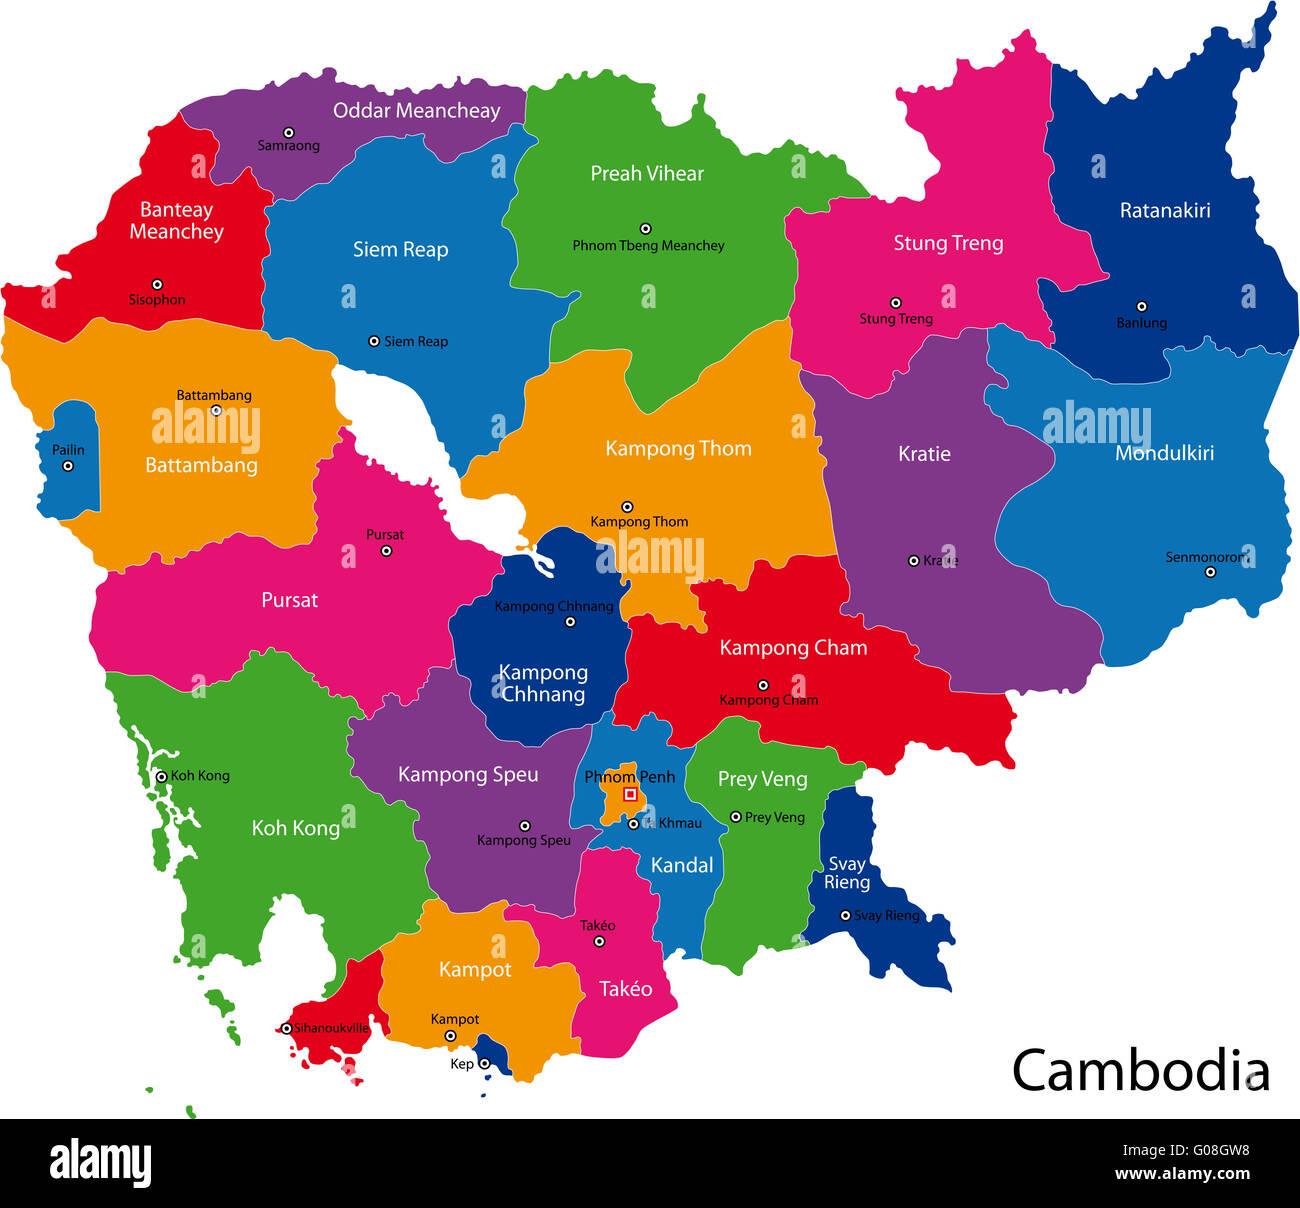 Kambodscha Karte.Kambodscha Karte Stockfoto Bild 103451076 Alamy